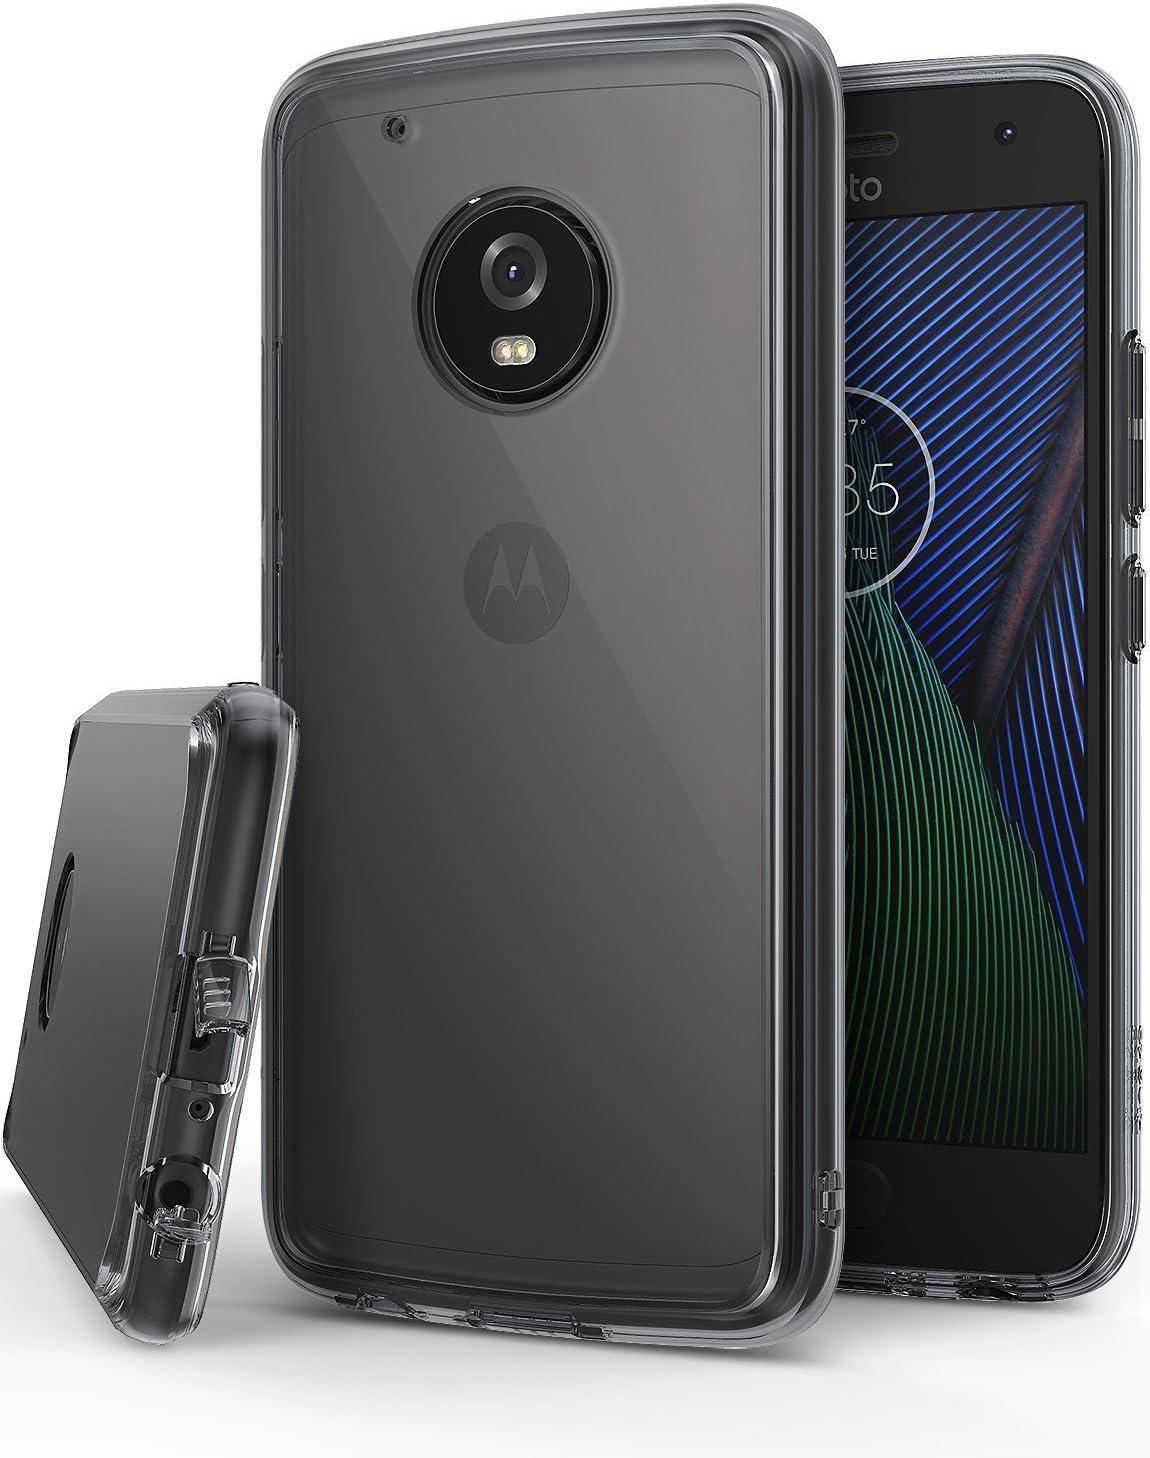 Ringke Funda para Motorola Moto G5 Plus, [Fusion] Protector de TPU con Parte Posterior Transparente de PC Caso Protectora biselada para Motorola Moto G5+ - Negro Humo Smoke Black